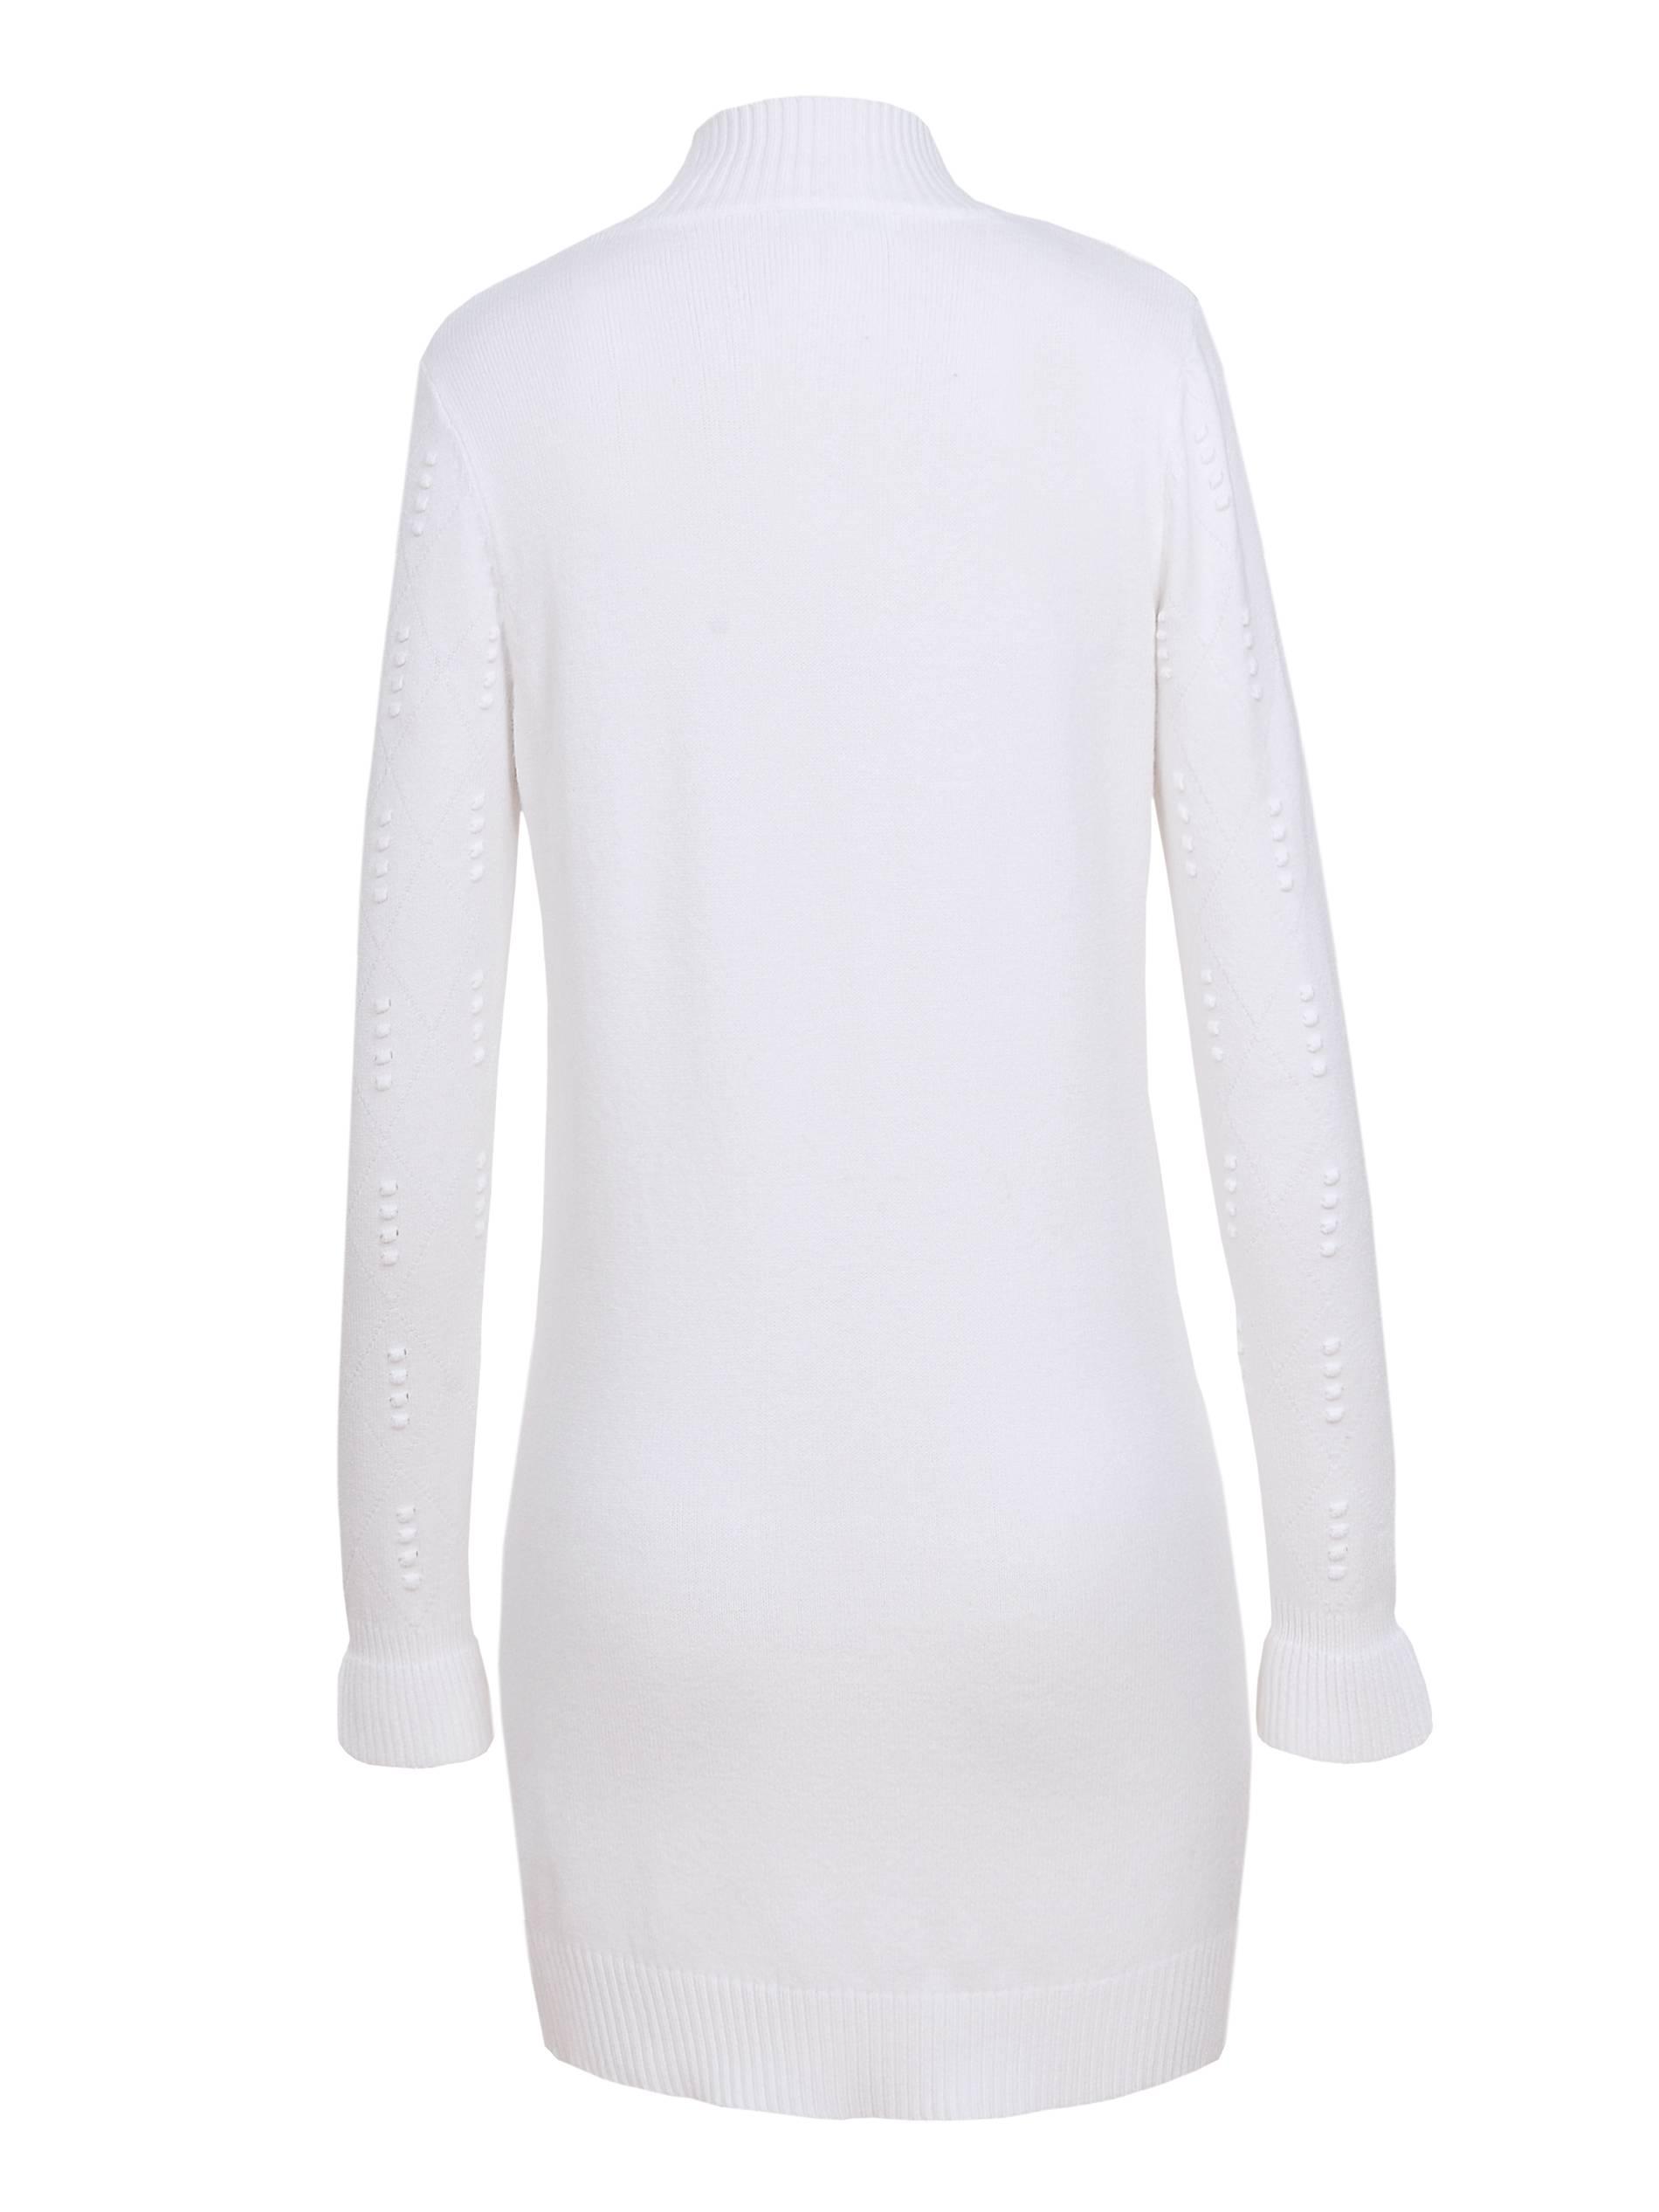 Vintage Wm.G Junior Original Girl Boss Work Suit Boxy Jacket Mod Knit Wiggle Dress Fits Small 1960\u2019s Set with Jacket /& Dress